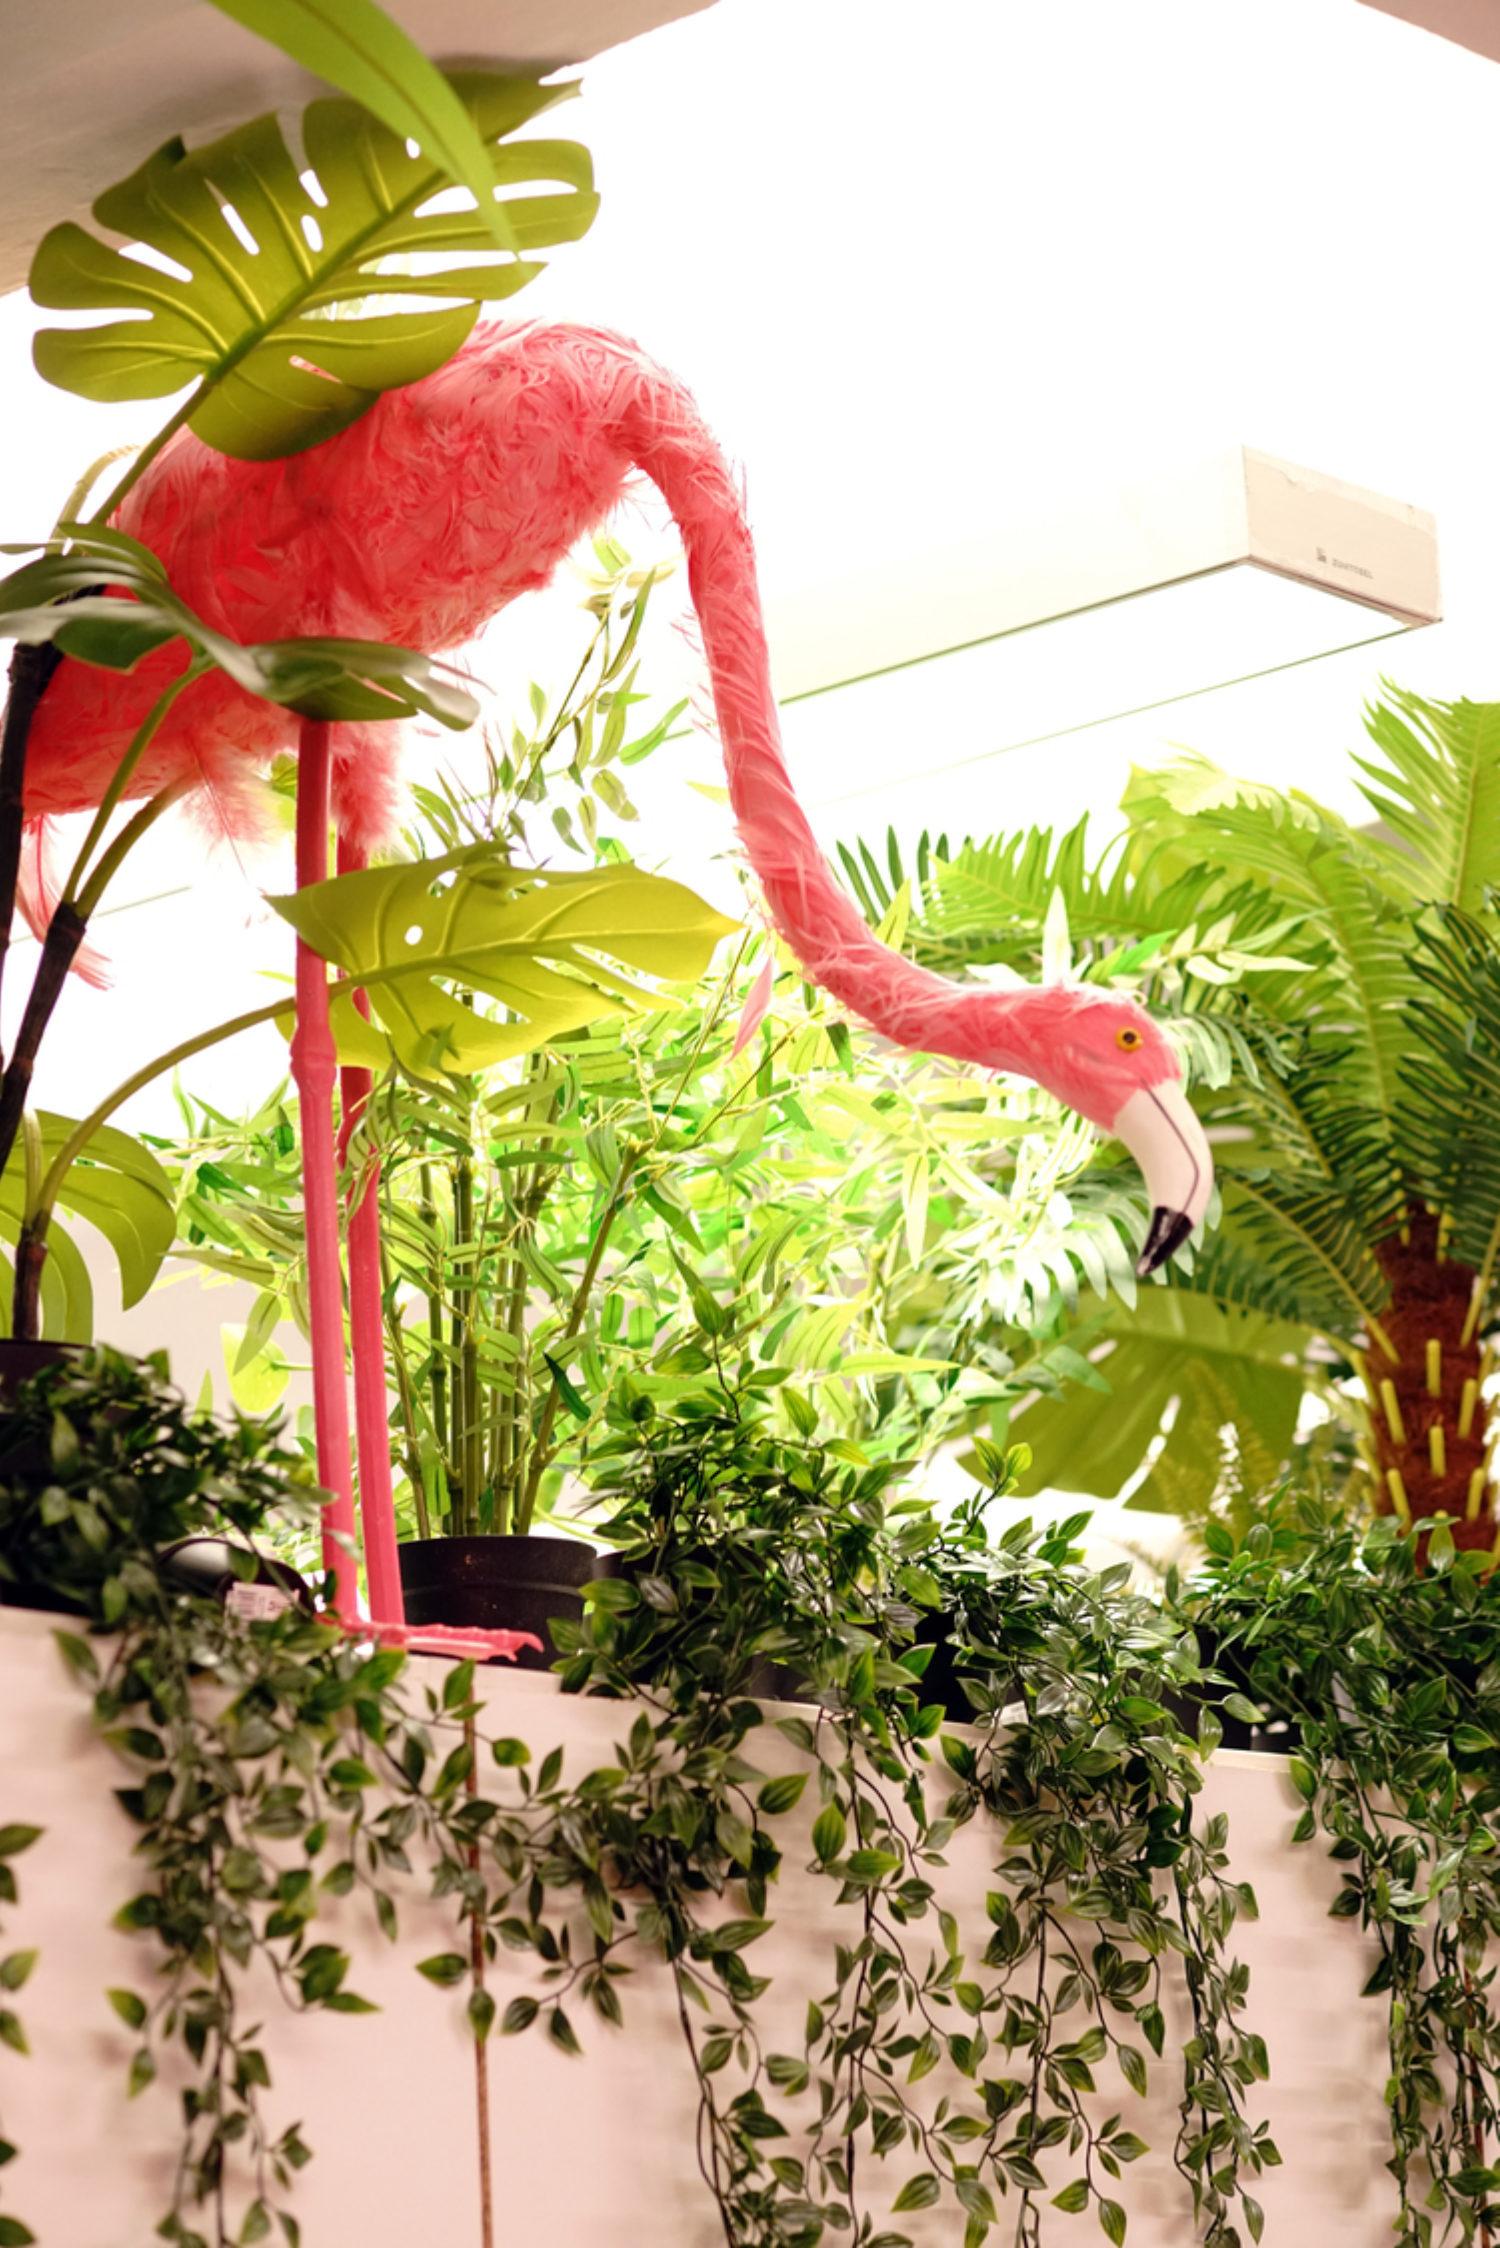 Virgin pink flamingo and plants hallways